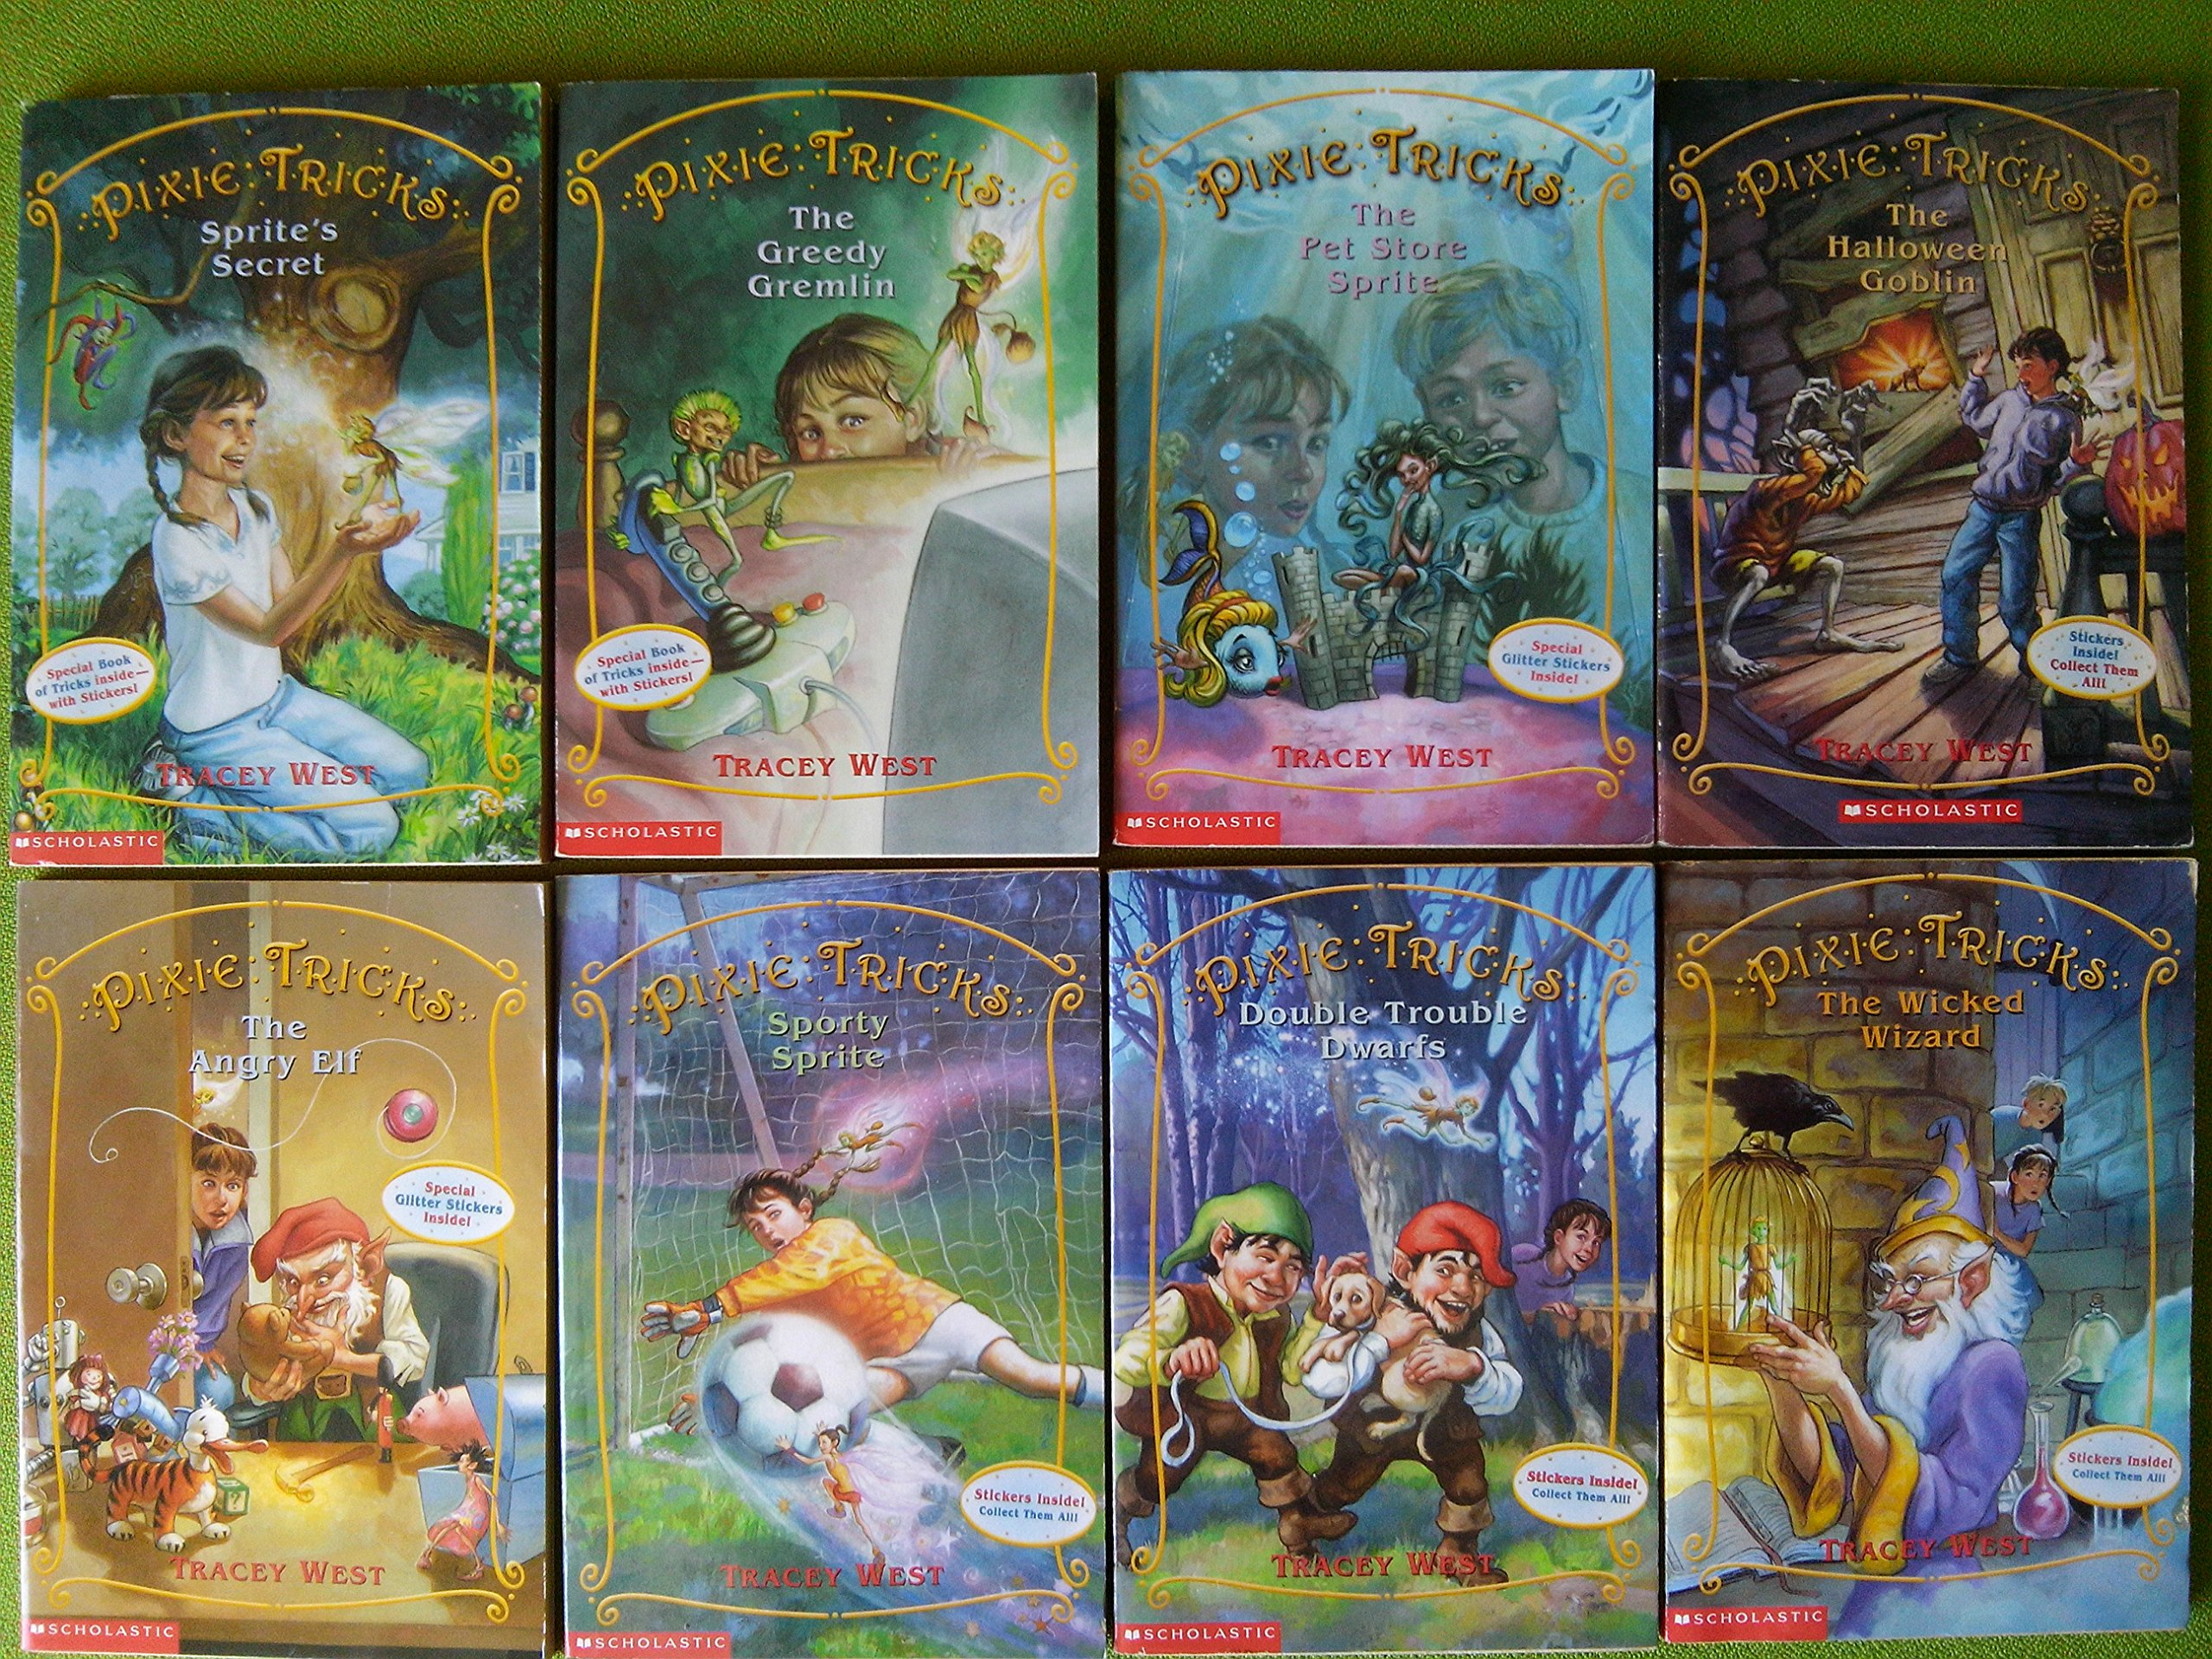 Pixie Tricks Complete Set Books product image